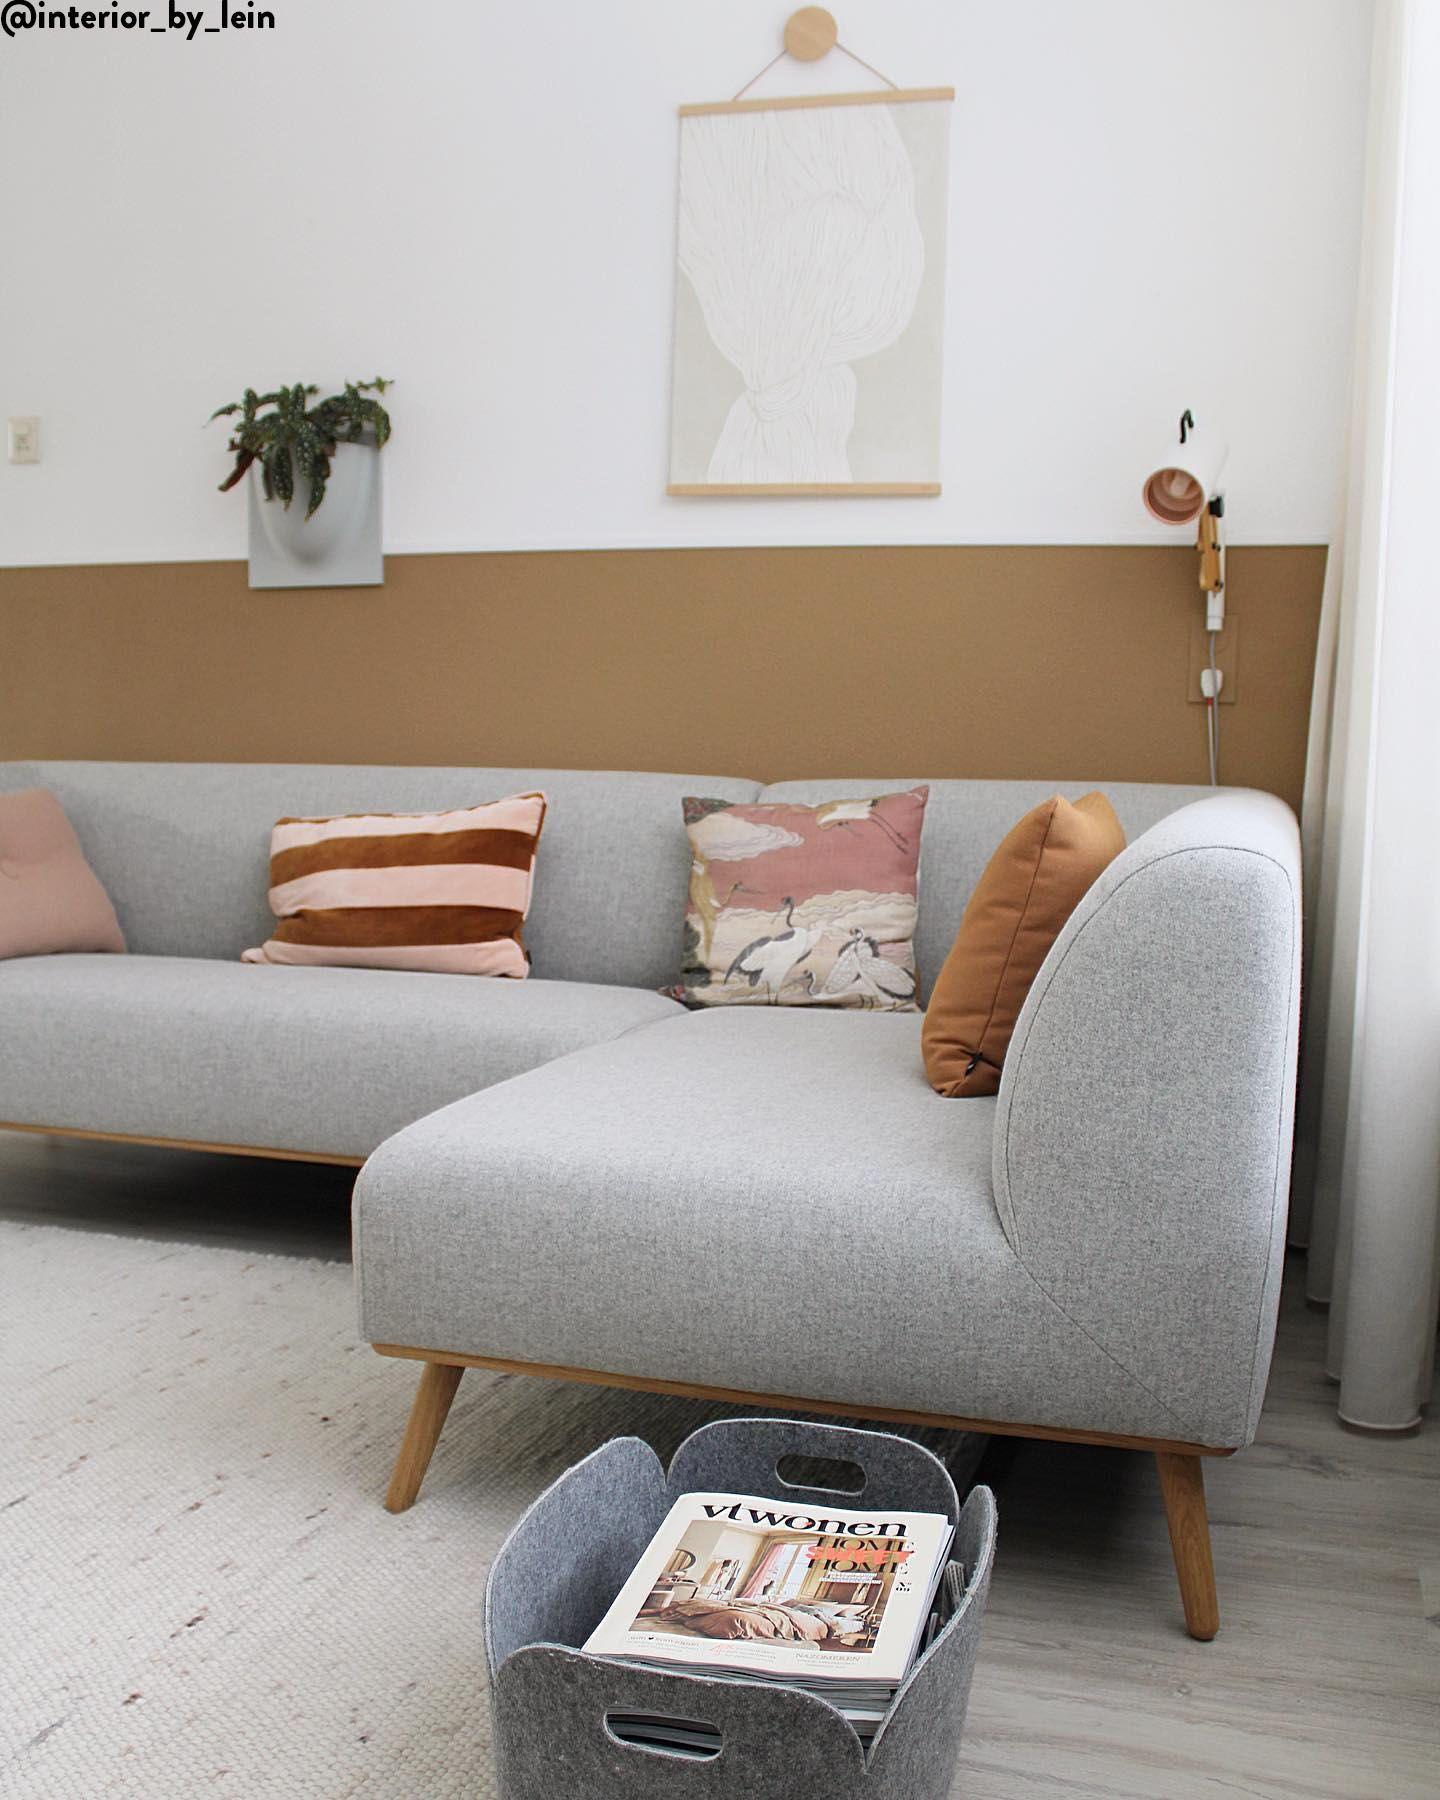 Ecksofa Archie Westwingnow In 2020 Ecksofa Room Inspo Sofa